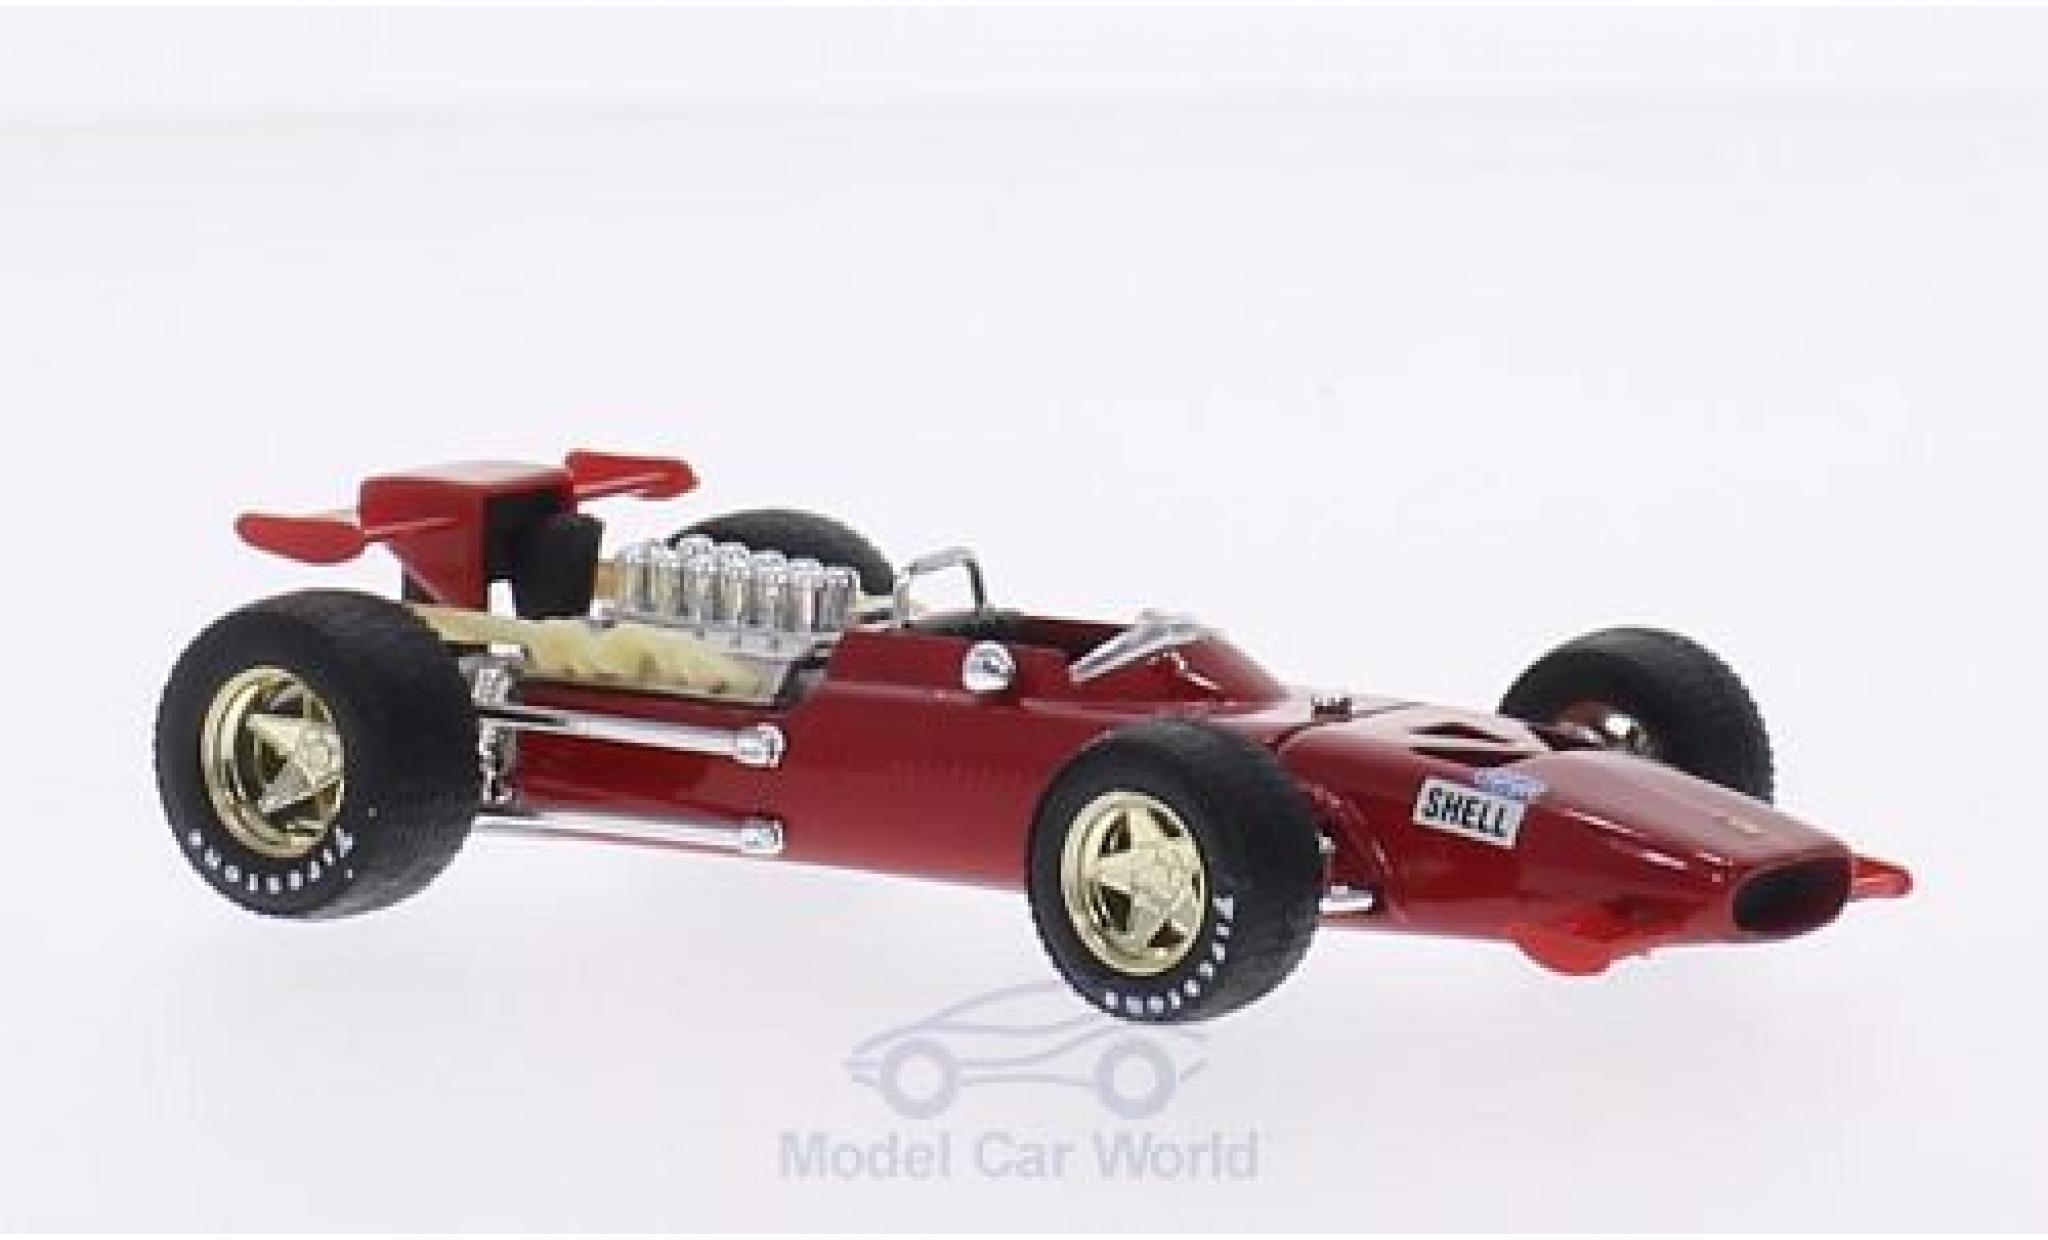 Ferrari 312 1/43 Brumm F1 Formel 1 Modena 1969 Testfahrzeug C.Amon